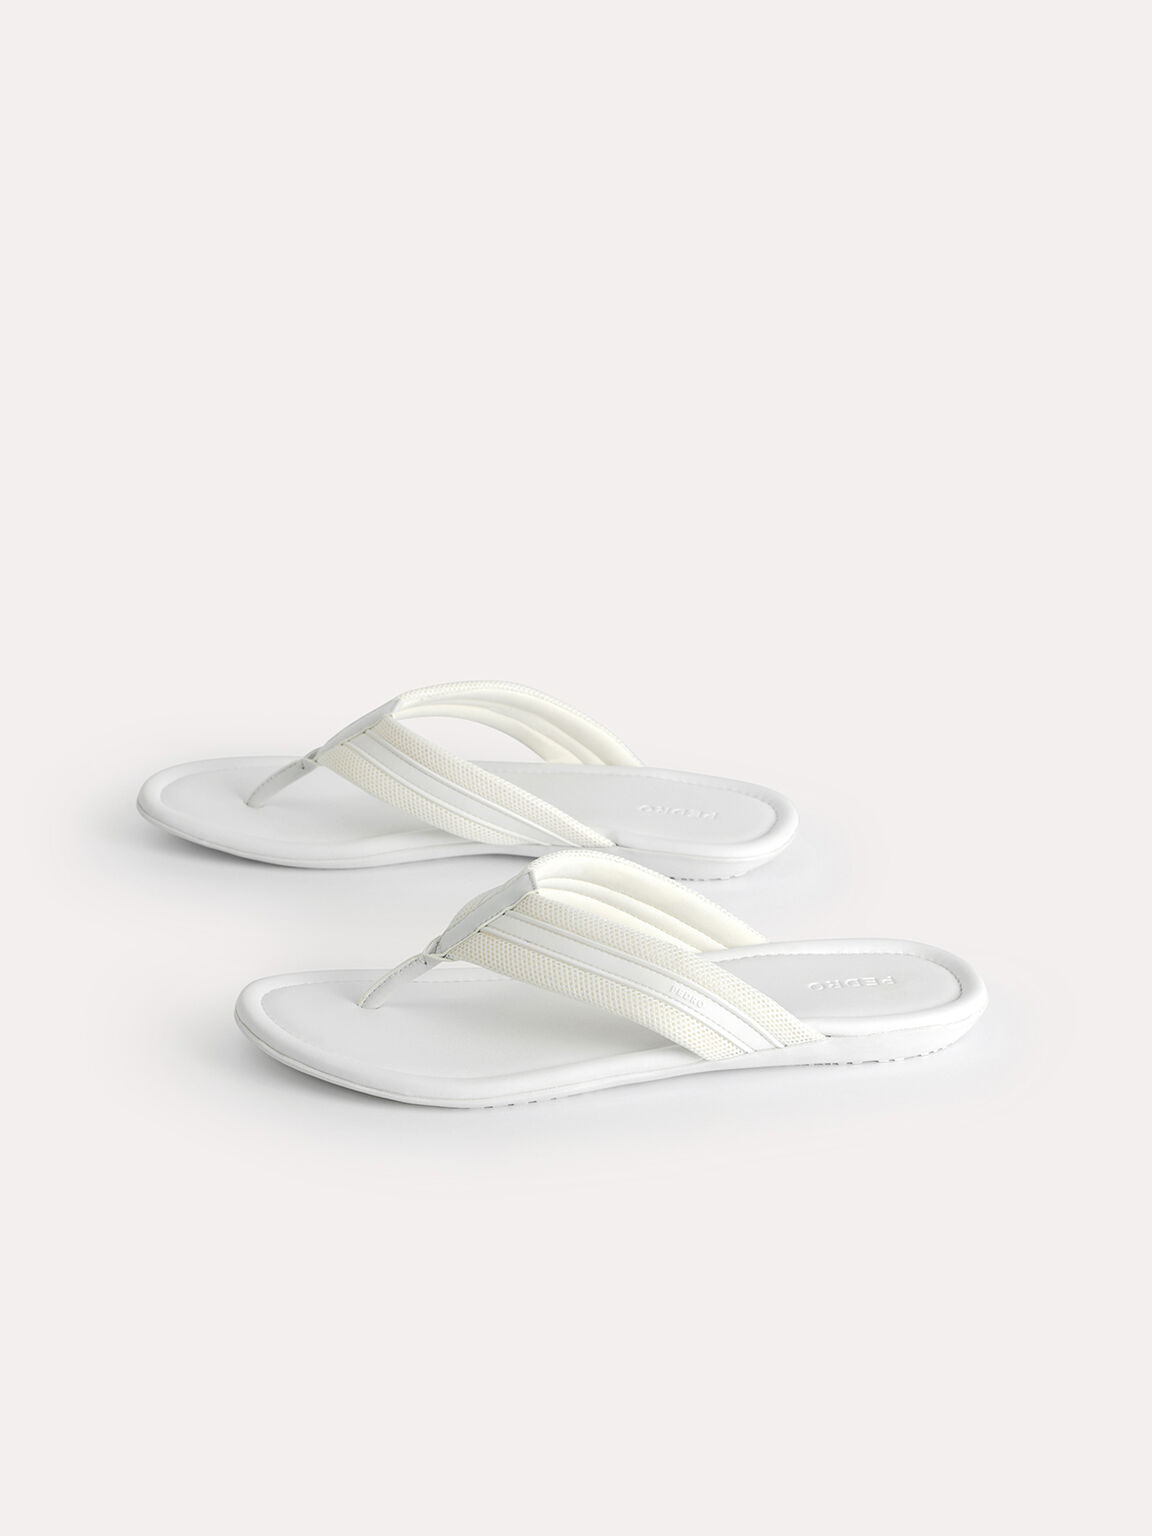 Thong Sandals, White, hi-res